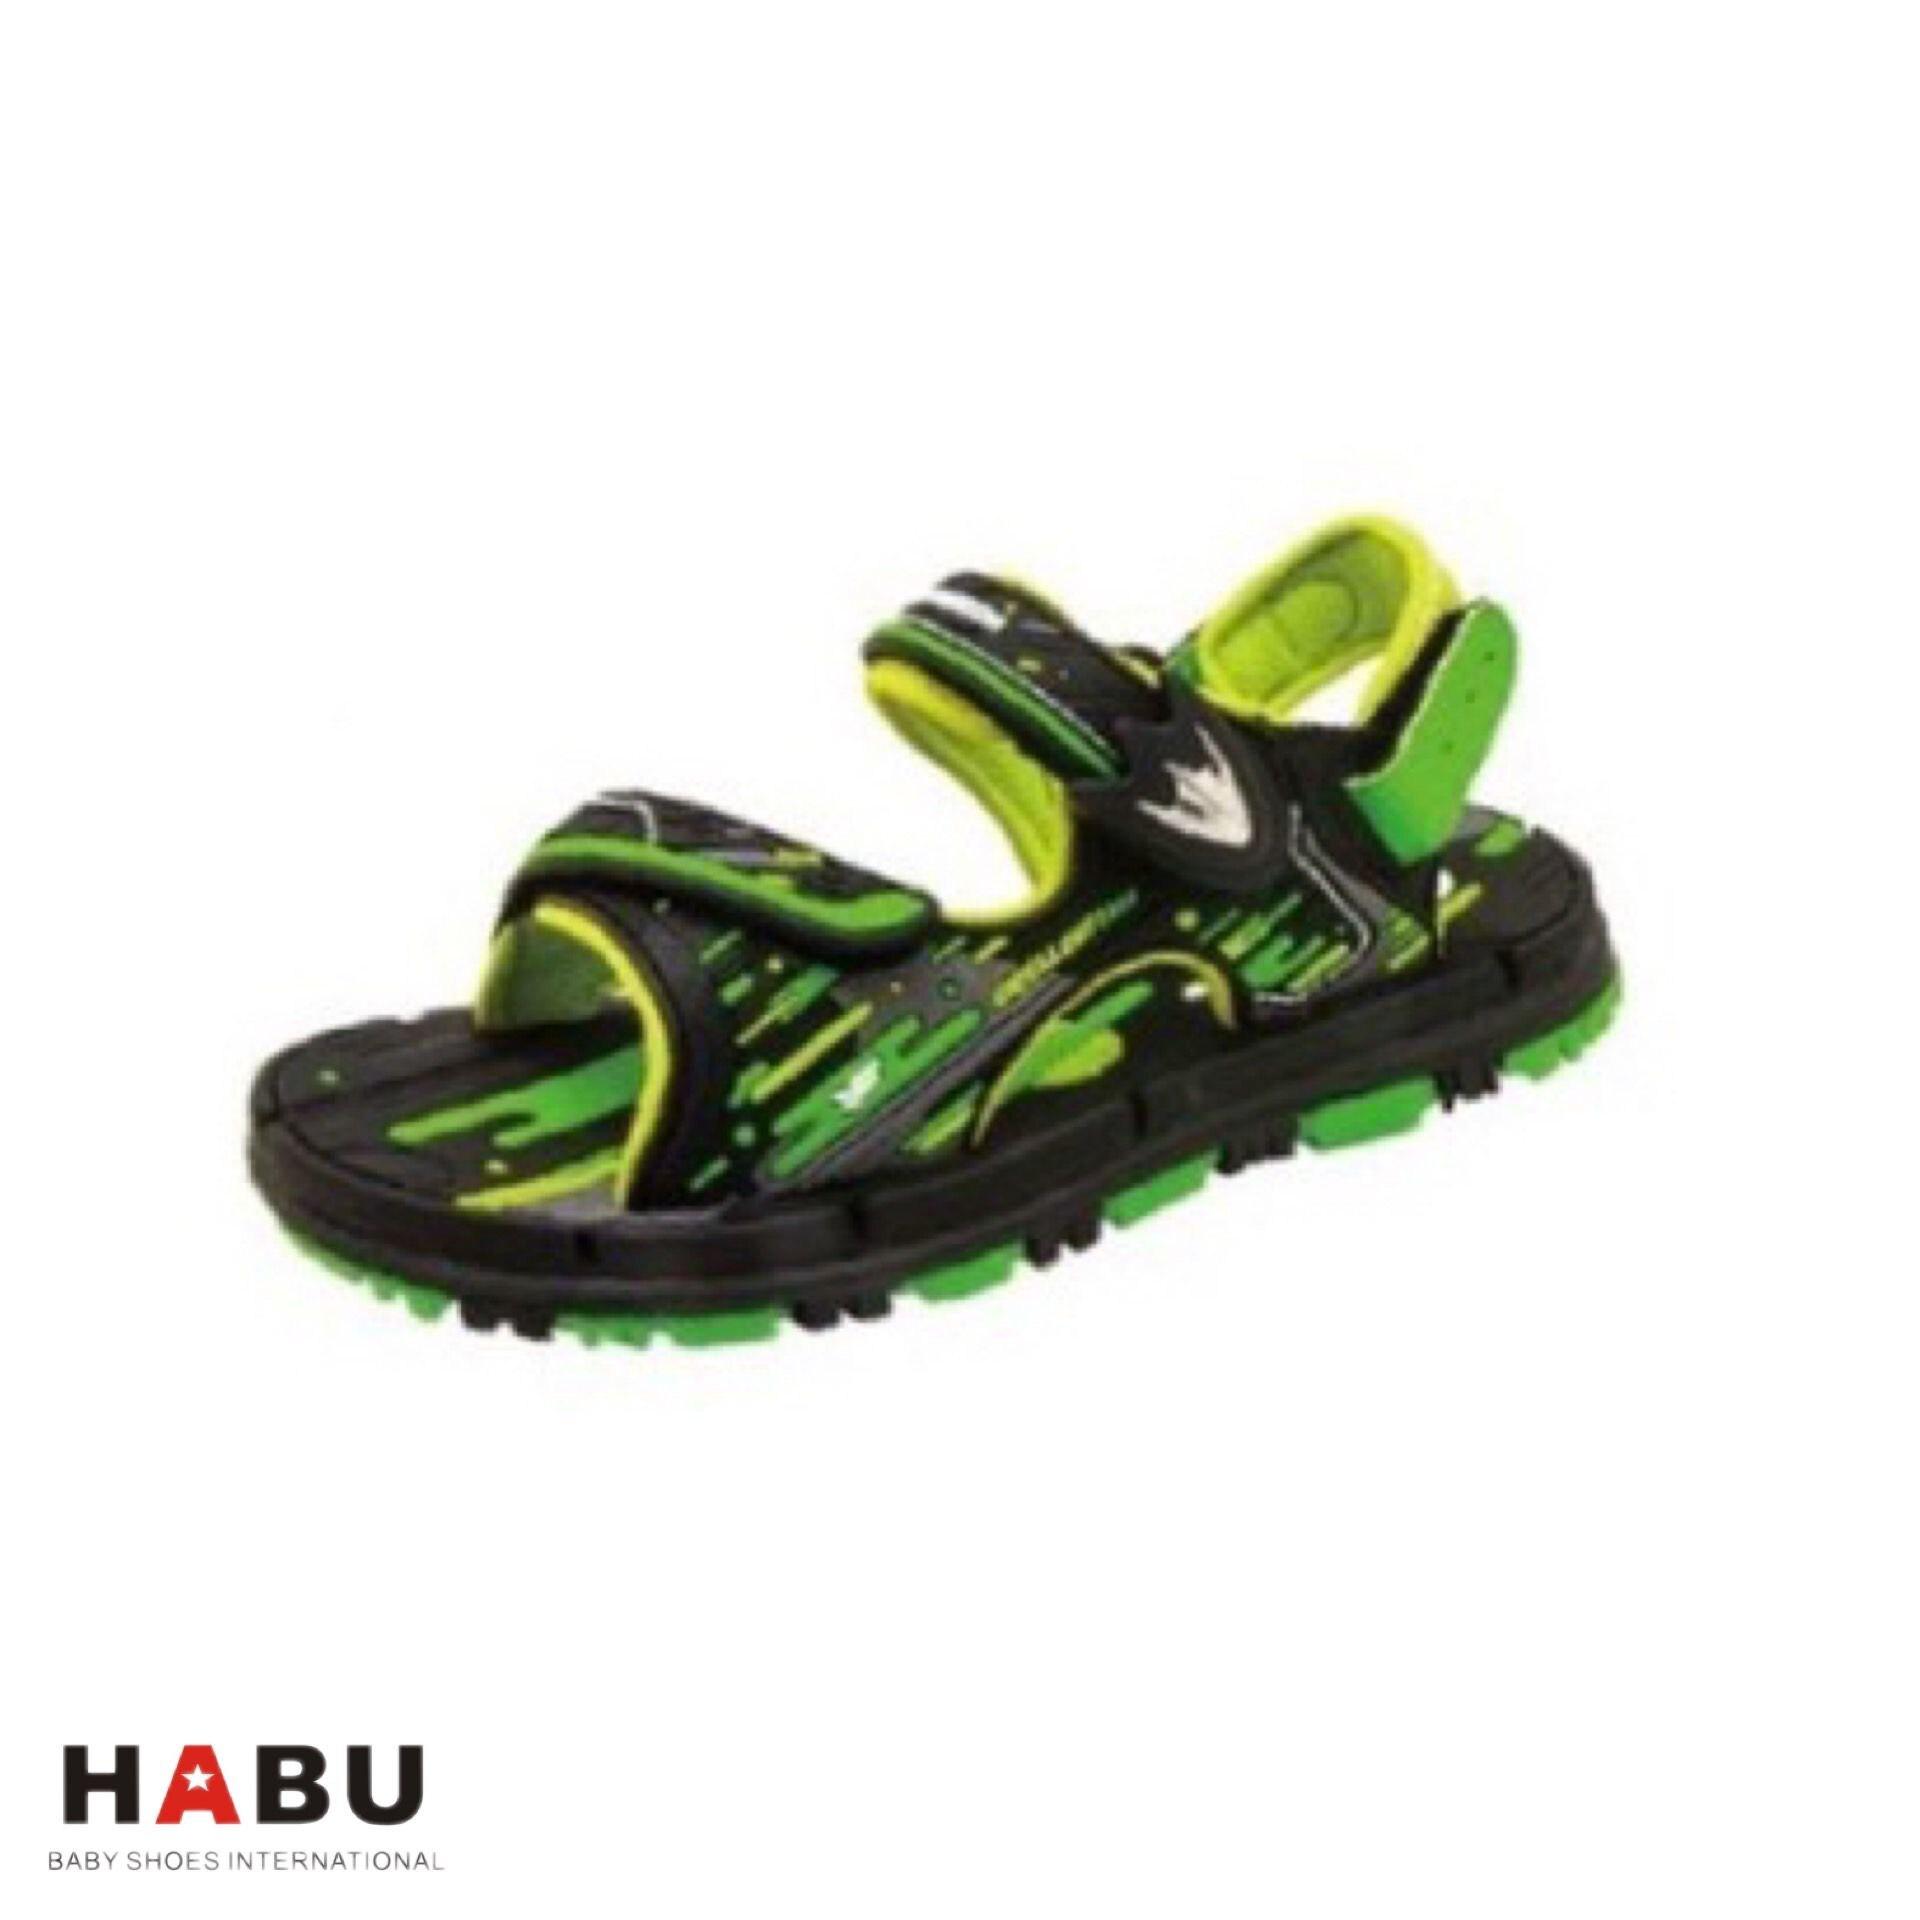 G.P 兒童休閒兩用涼拖鞋 綠色速乾涼鞋G0701B-60